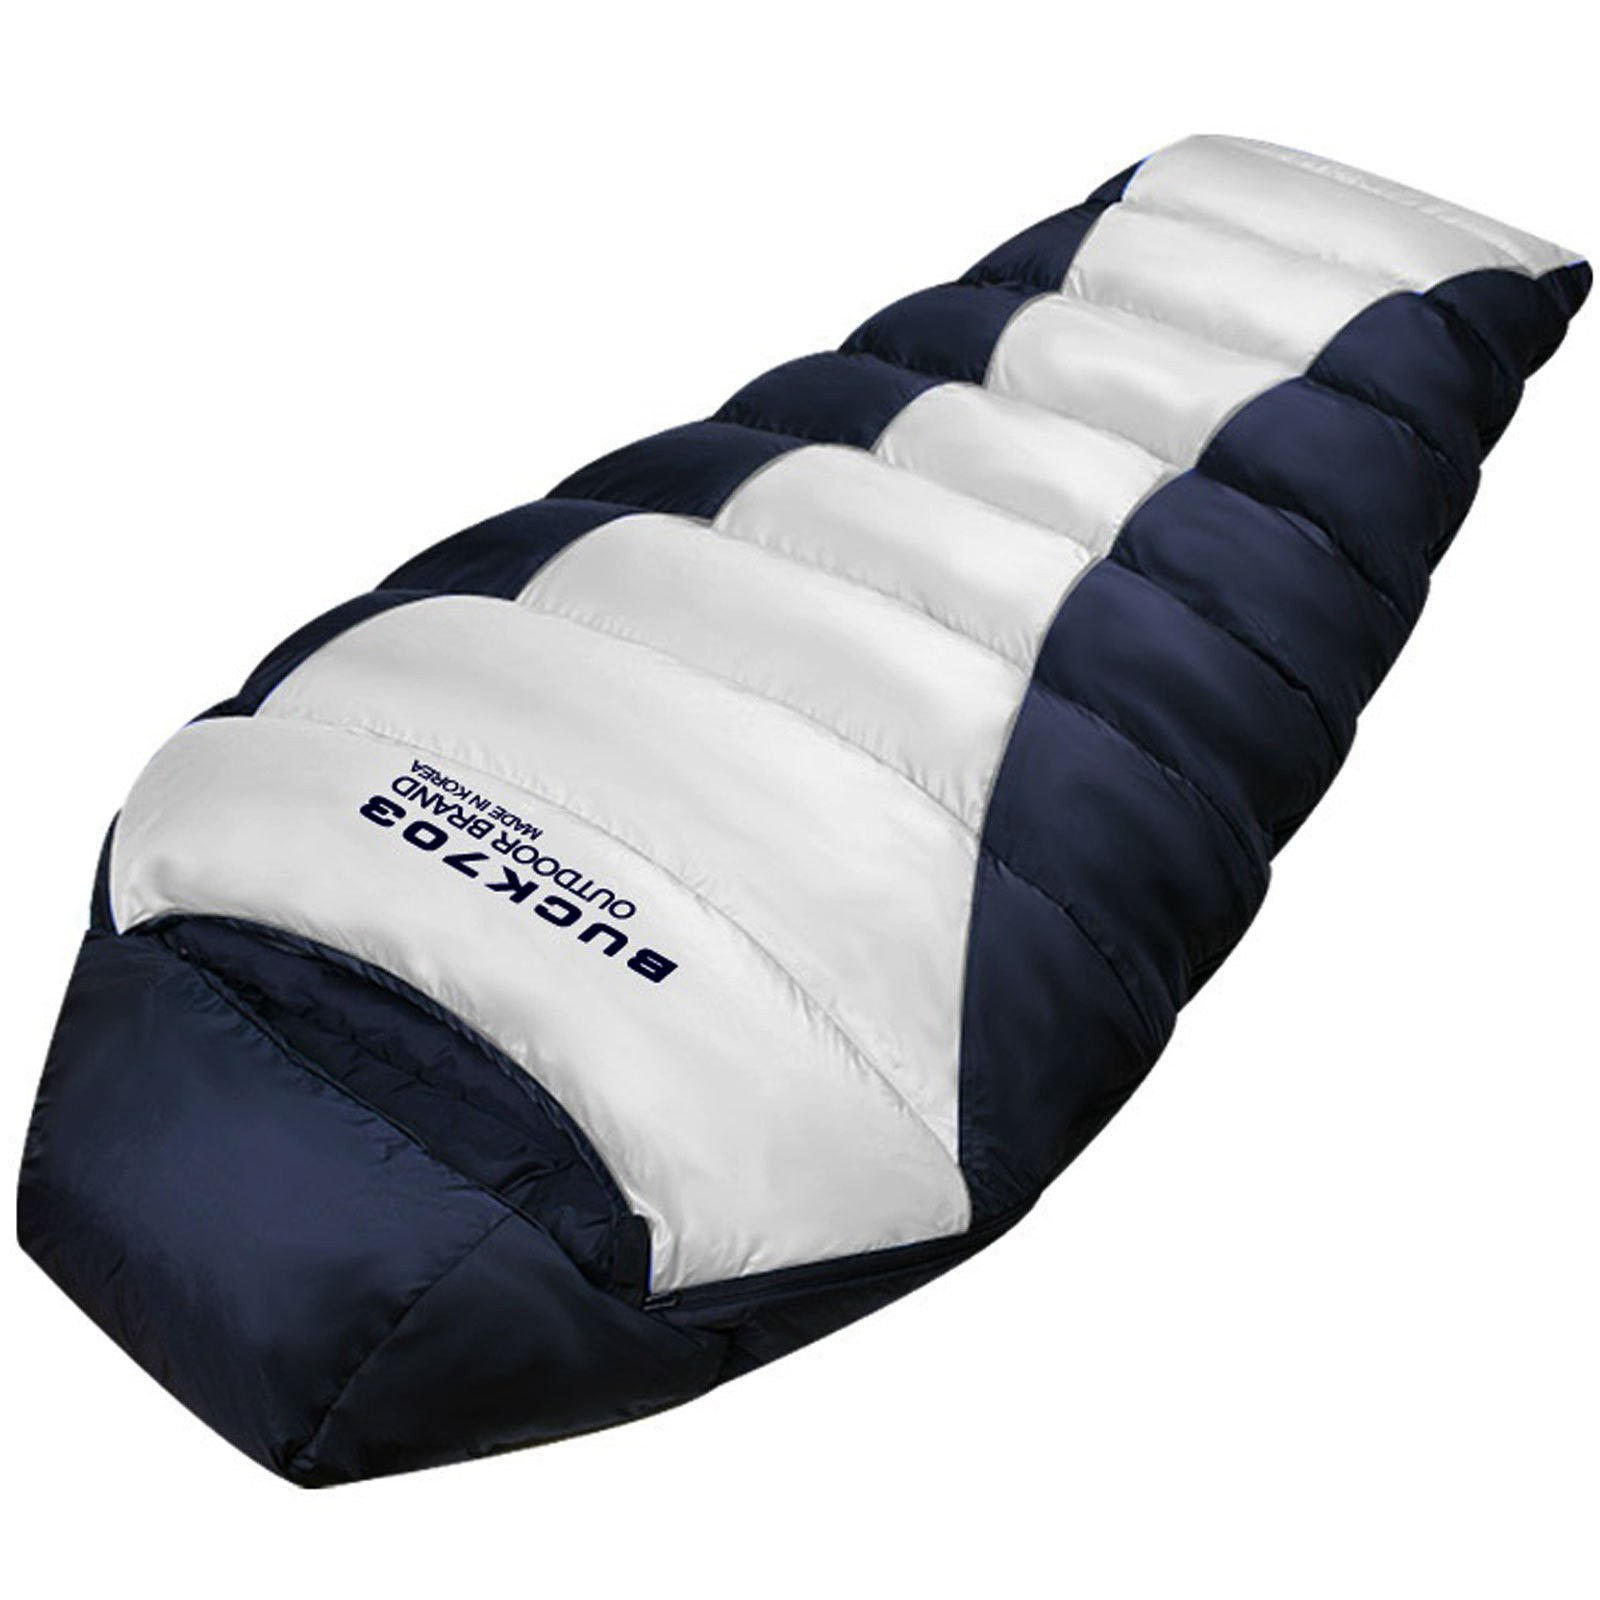 2XL Goose Down Sleeping Bag 4Season Backpacking Camping Lightweight Mummy Ultra by Sleeping Bag